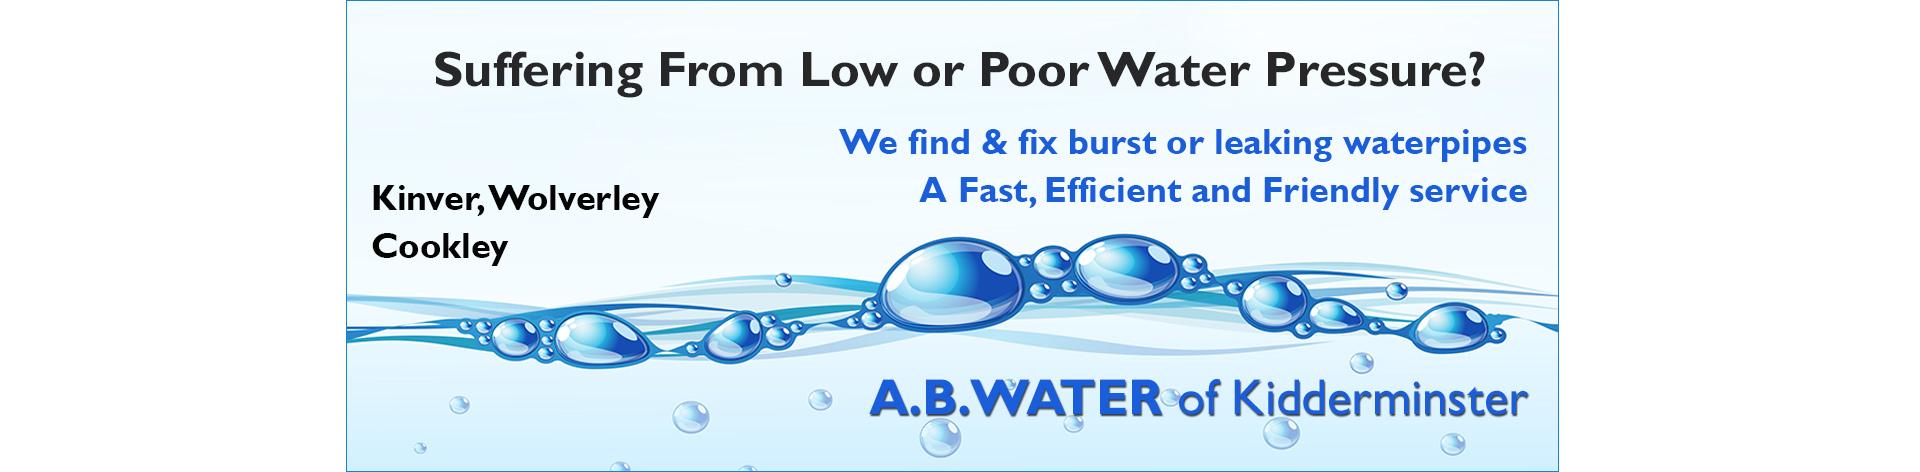 poor-water-pressure-kinver